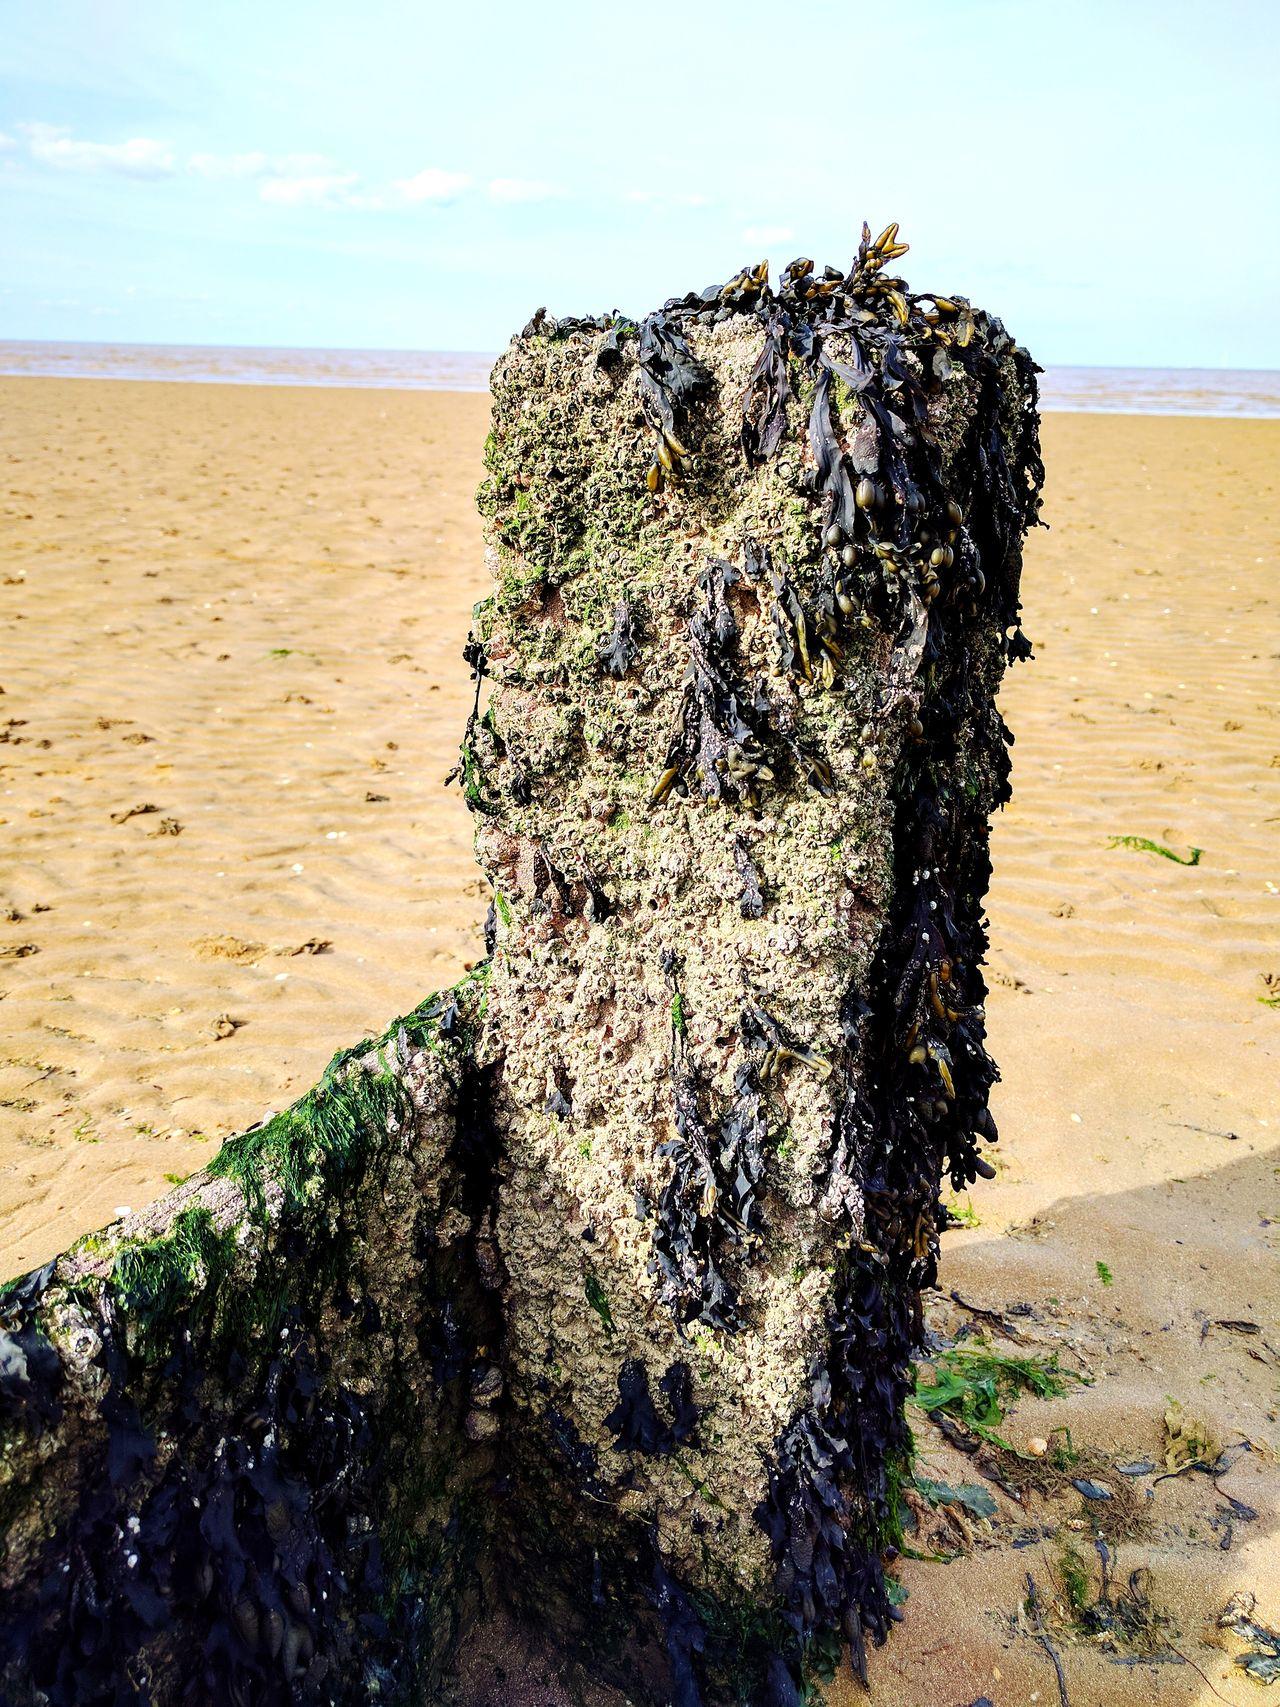 Beach Wood Beach Sea Sand Water Nature Day Outdoors Beauty In Nature Sky Horizon Over Water Shadow No People Seaweed Shells British Beaches